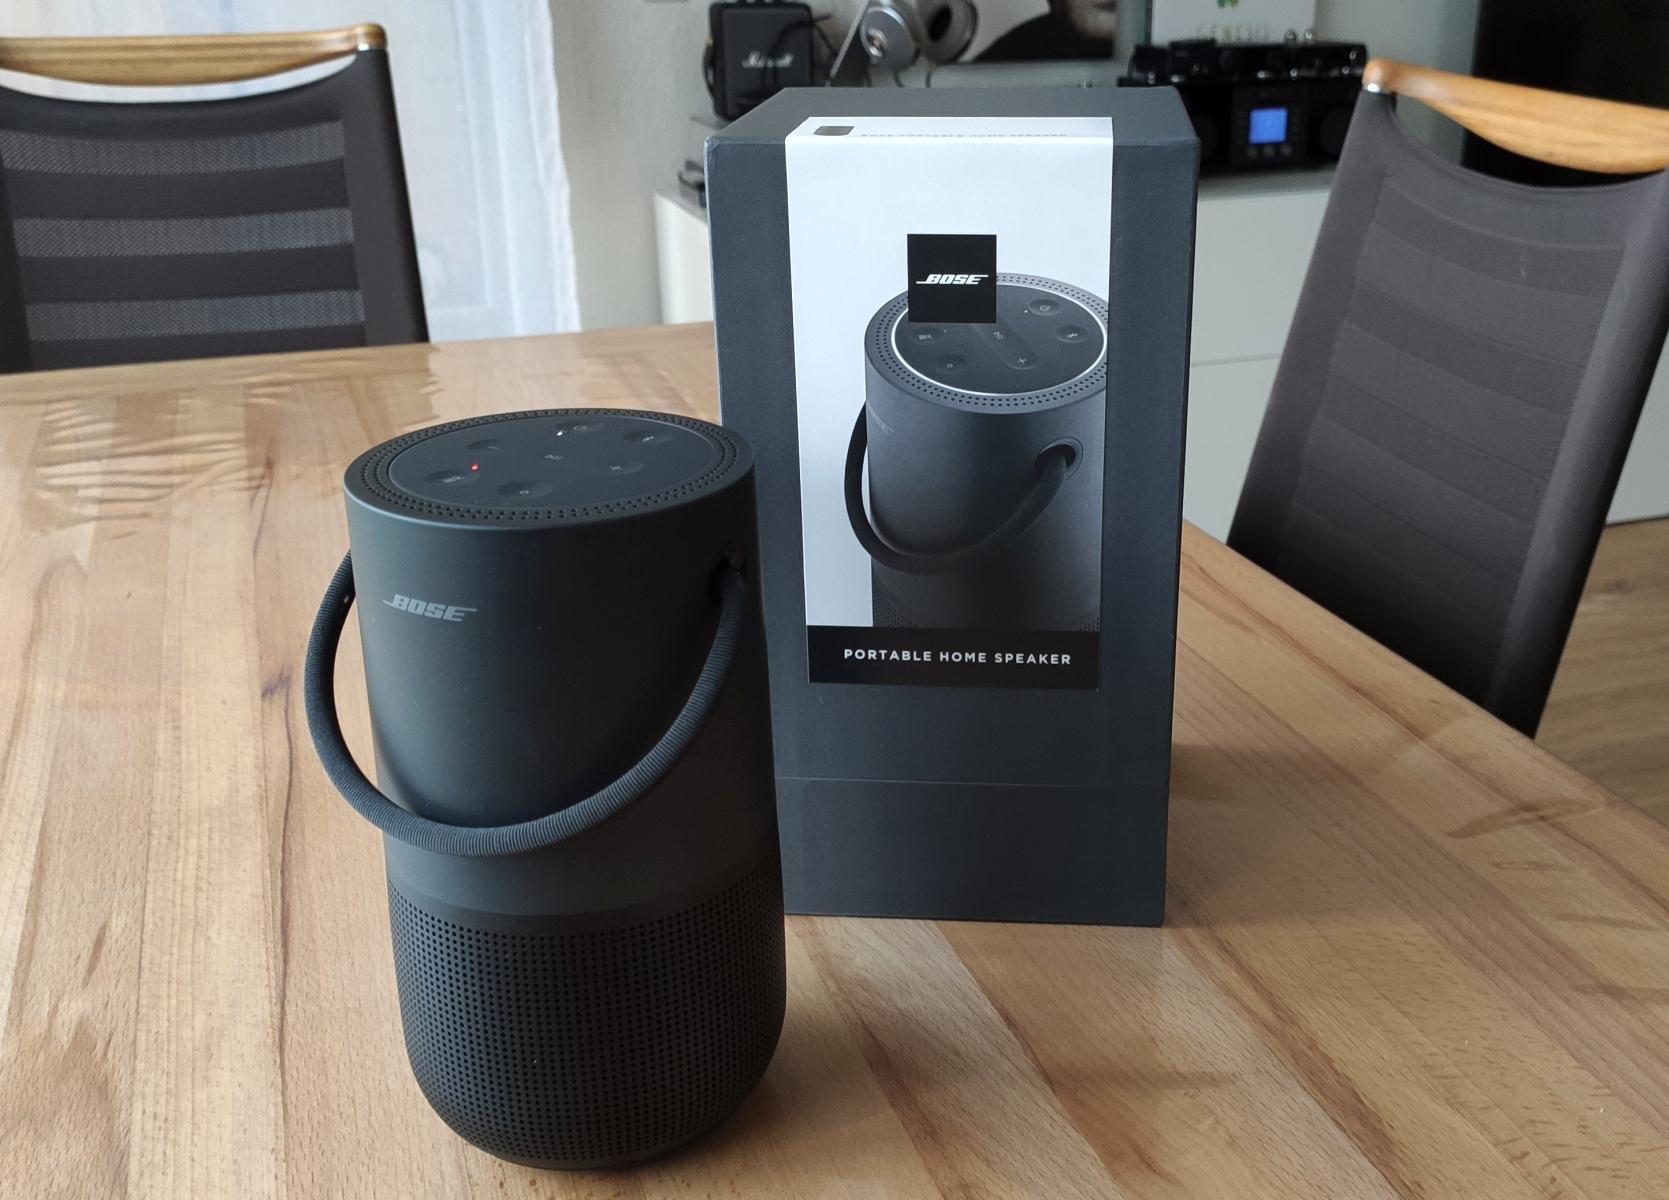 BOSE Portable Home Speaker im Test - Fast perfekt! - Miniklangwunder